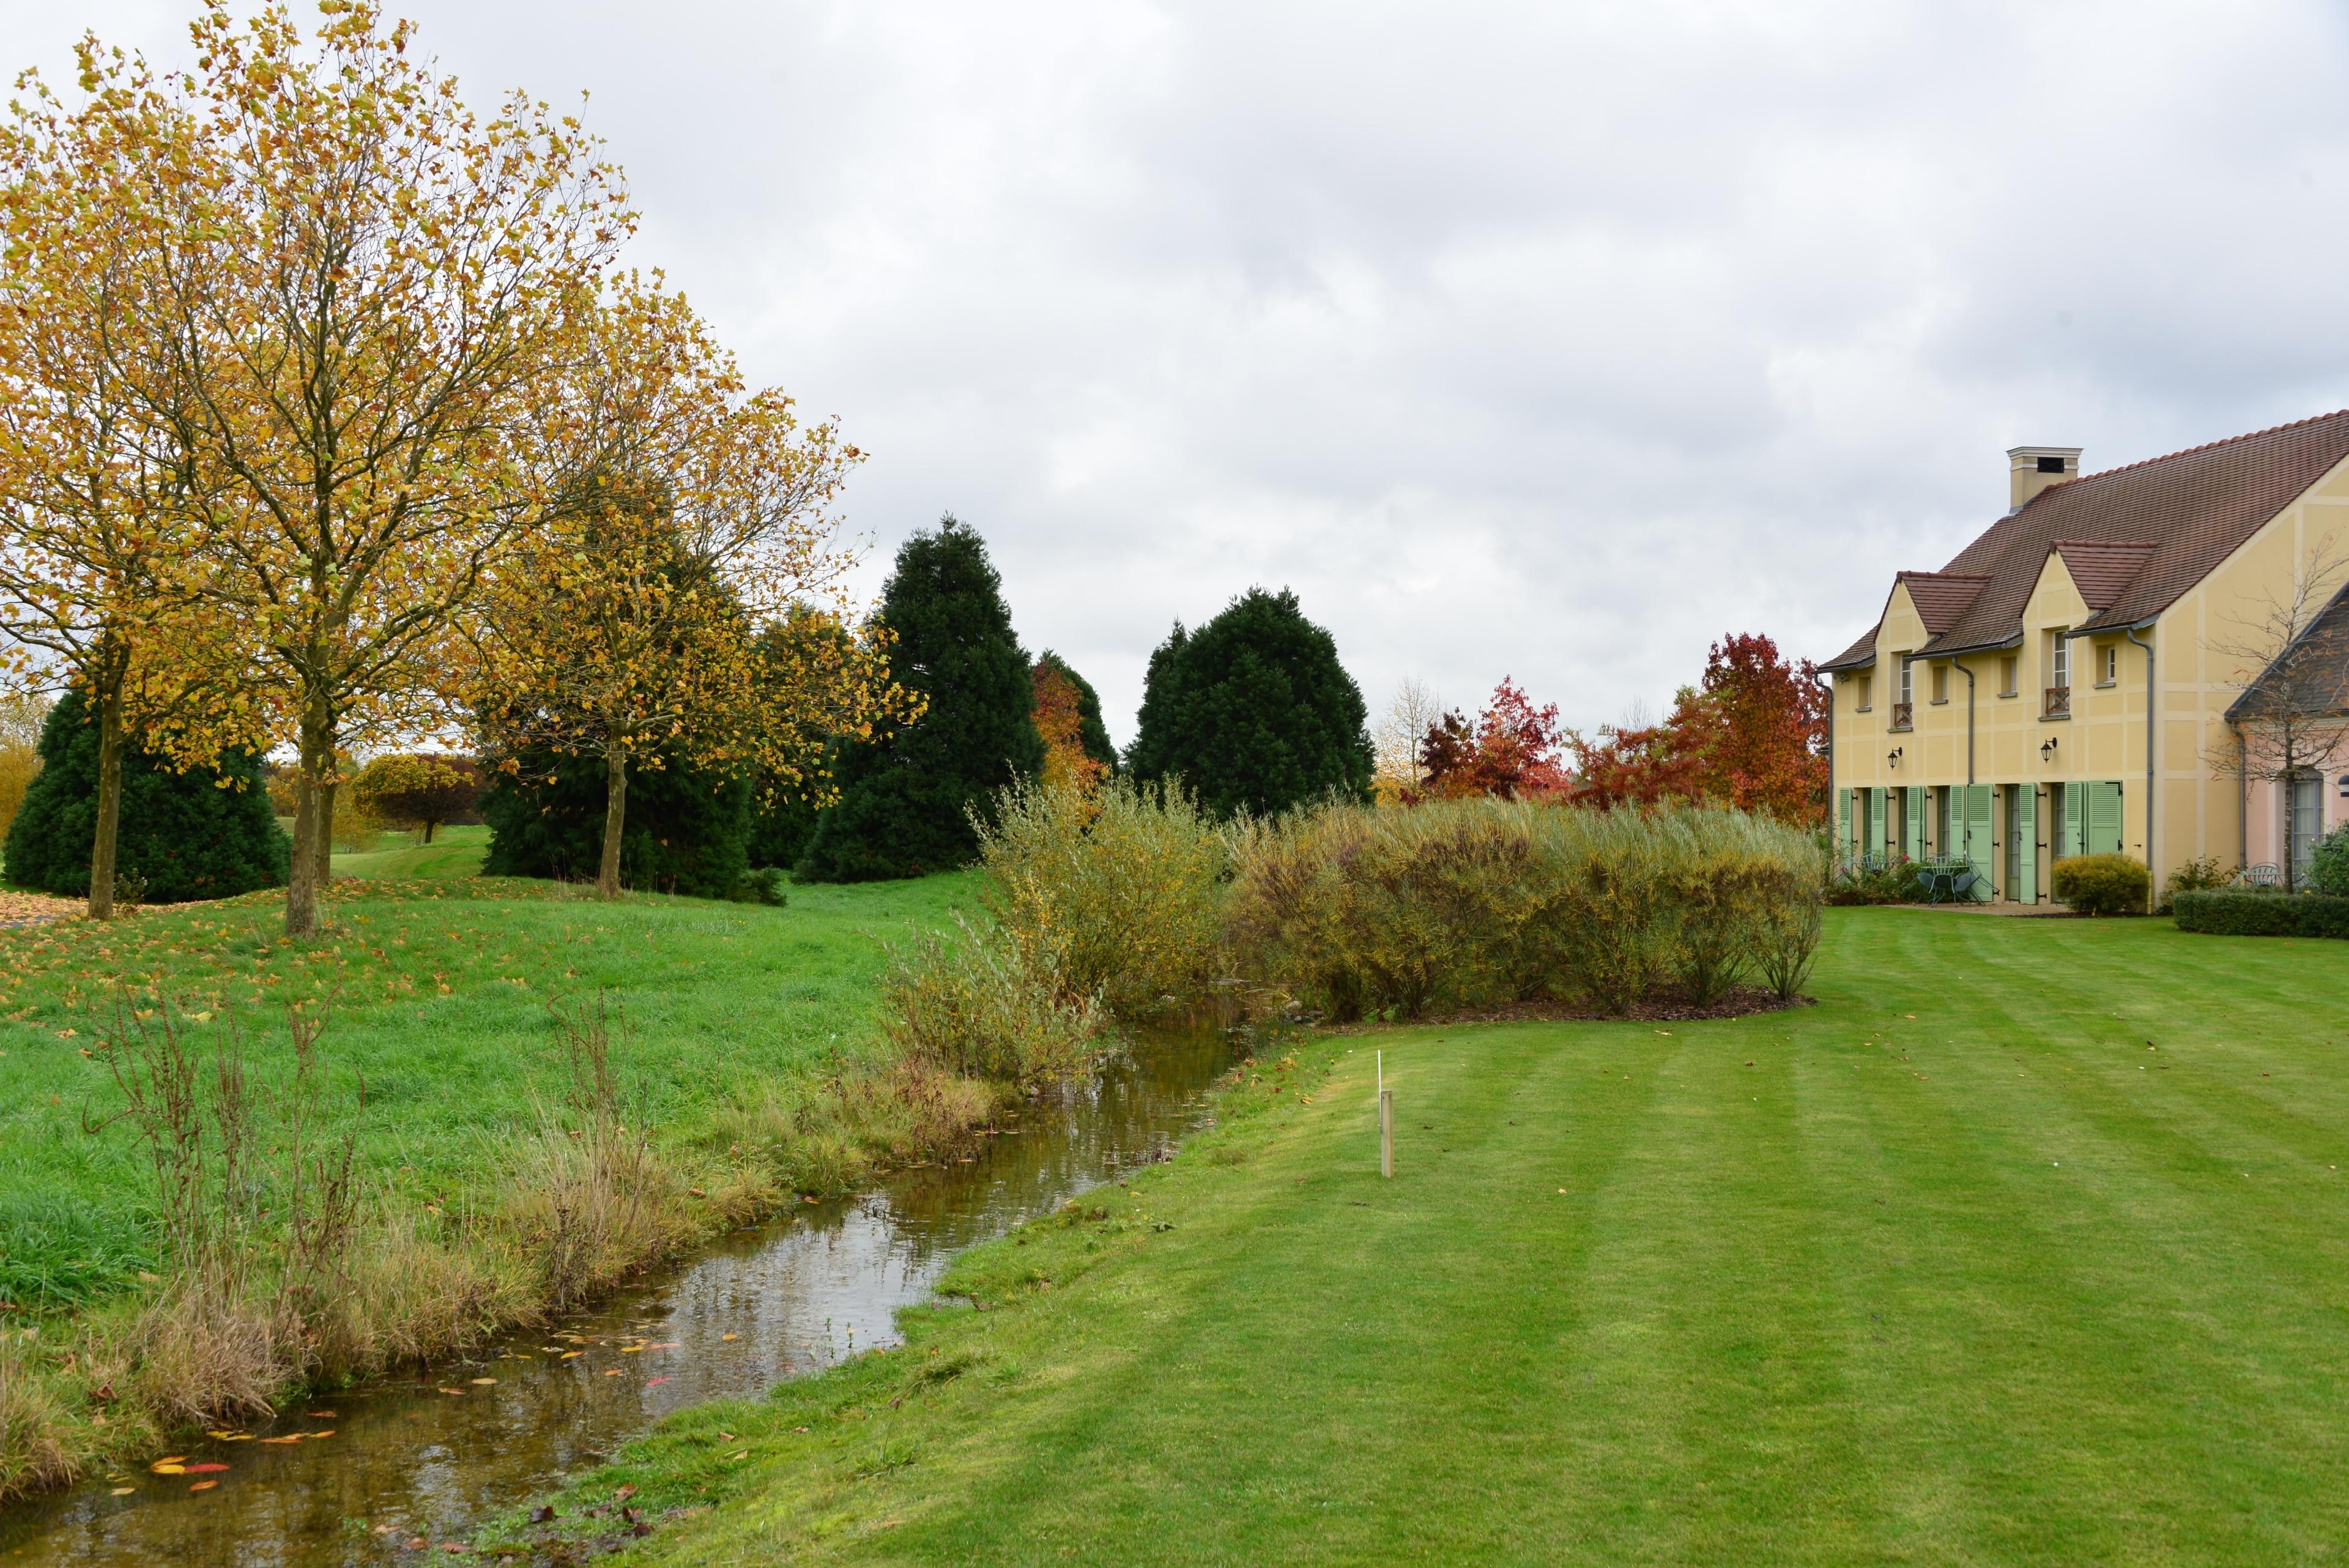 Bailly-Romainvilliers, Seine-et-Marne (departement), Frankrijk